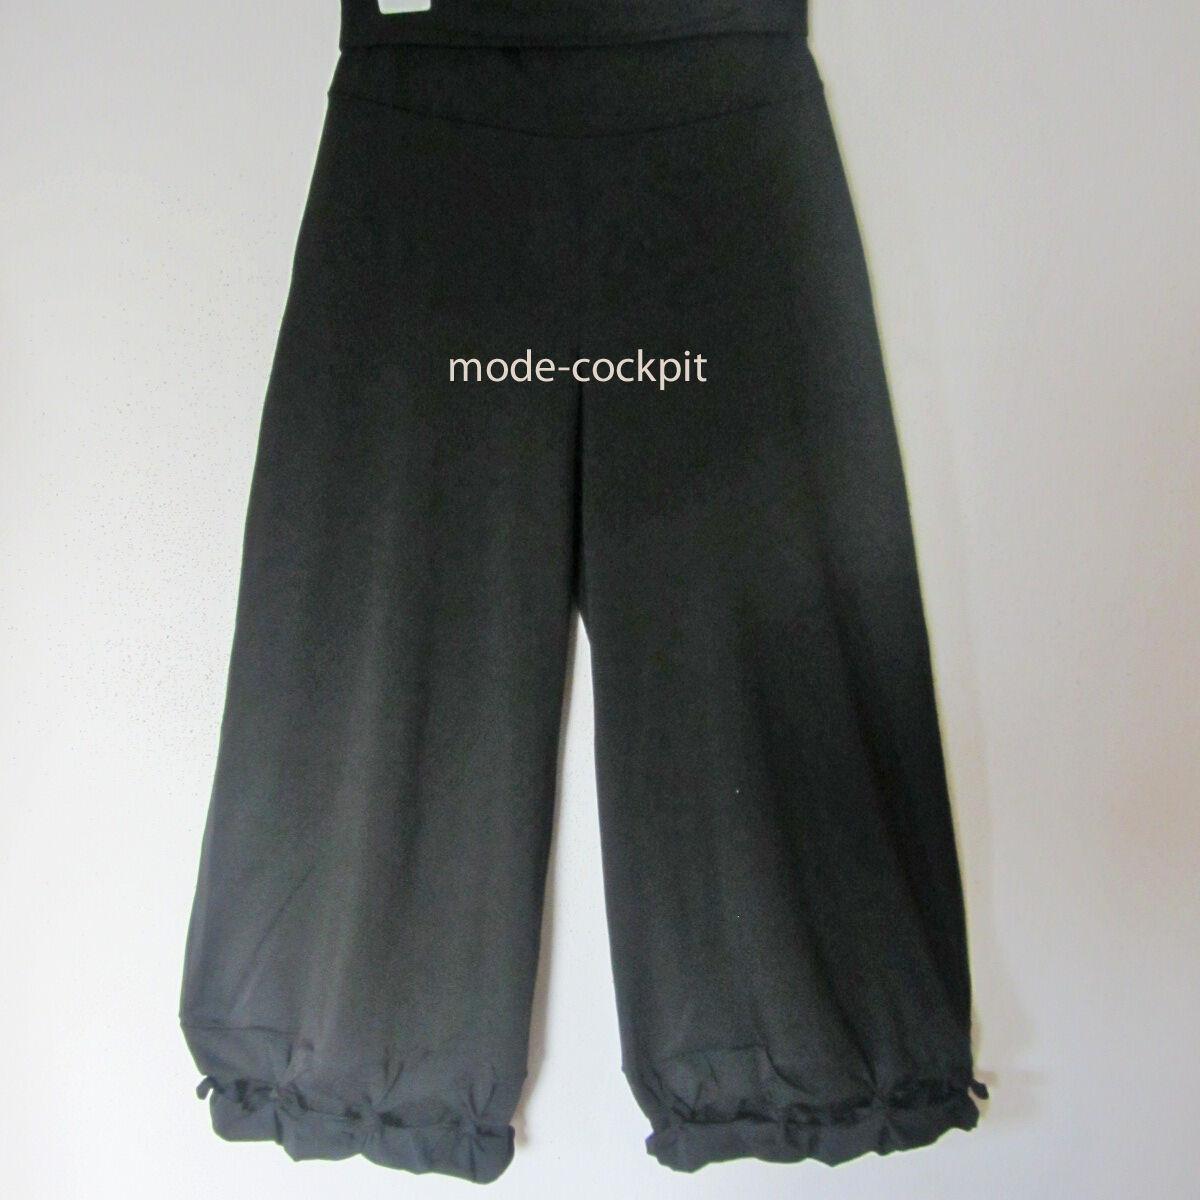 BORIS INDUSTRIES softe weite Hose Lagenlook Knoten Doubleface black 48-50 (3)